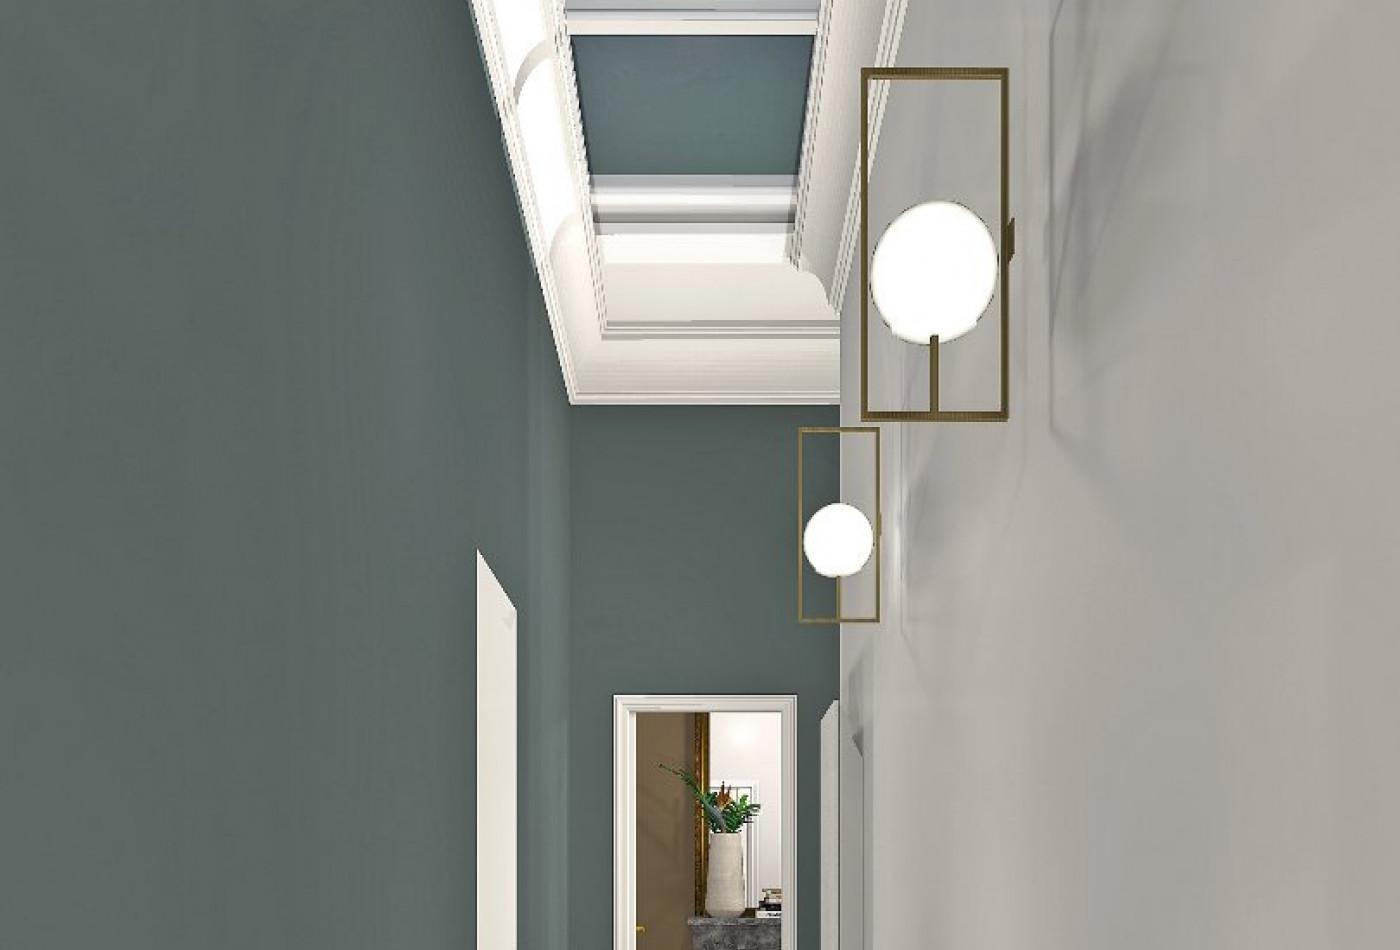 A vendre  Montpellier | Réf 340147838 - Agence galerie casanova